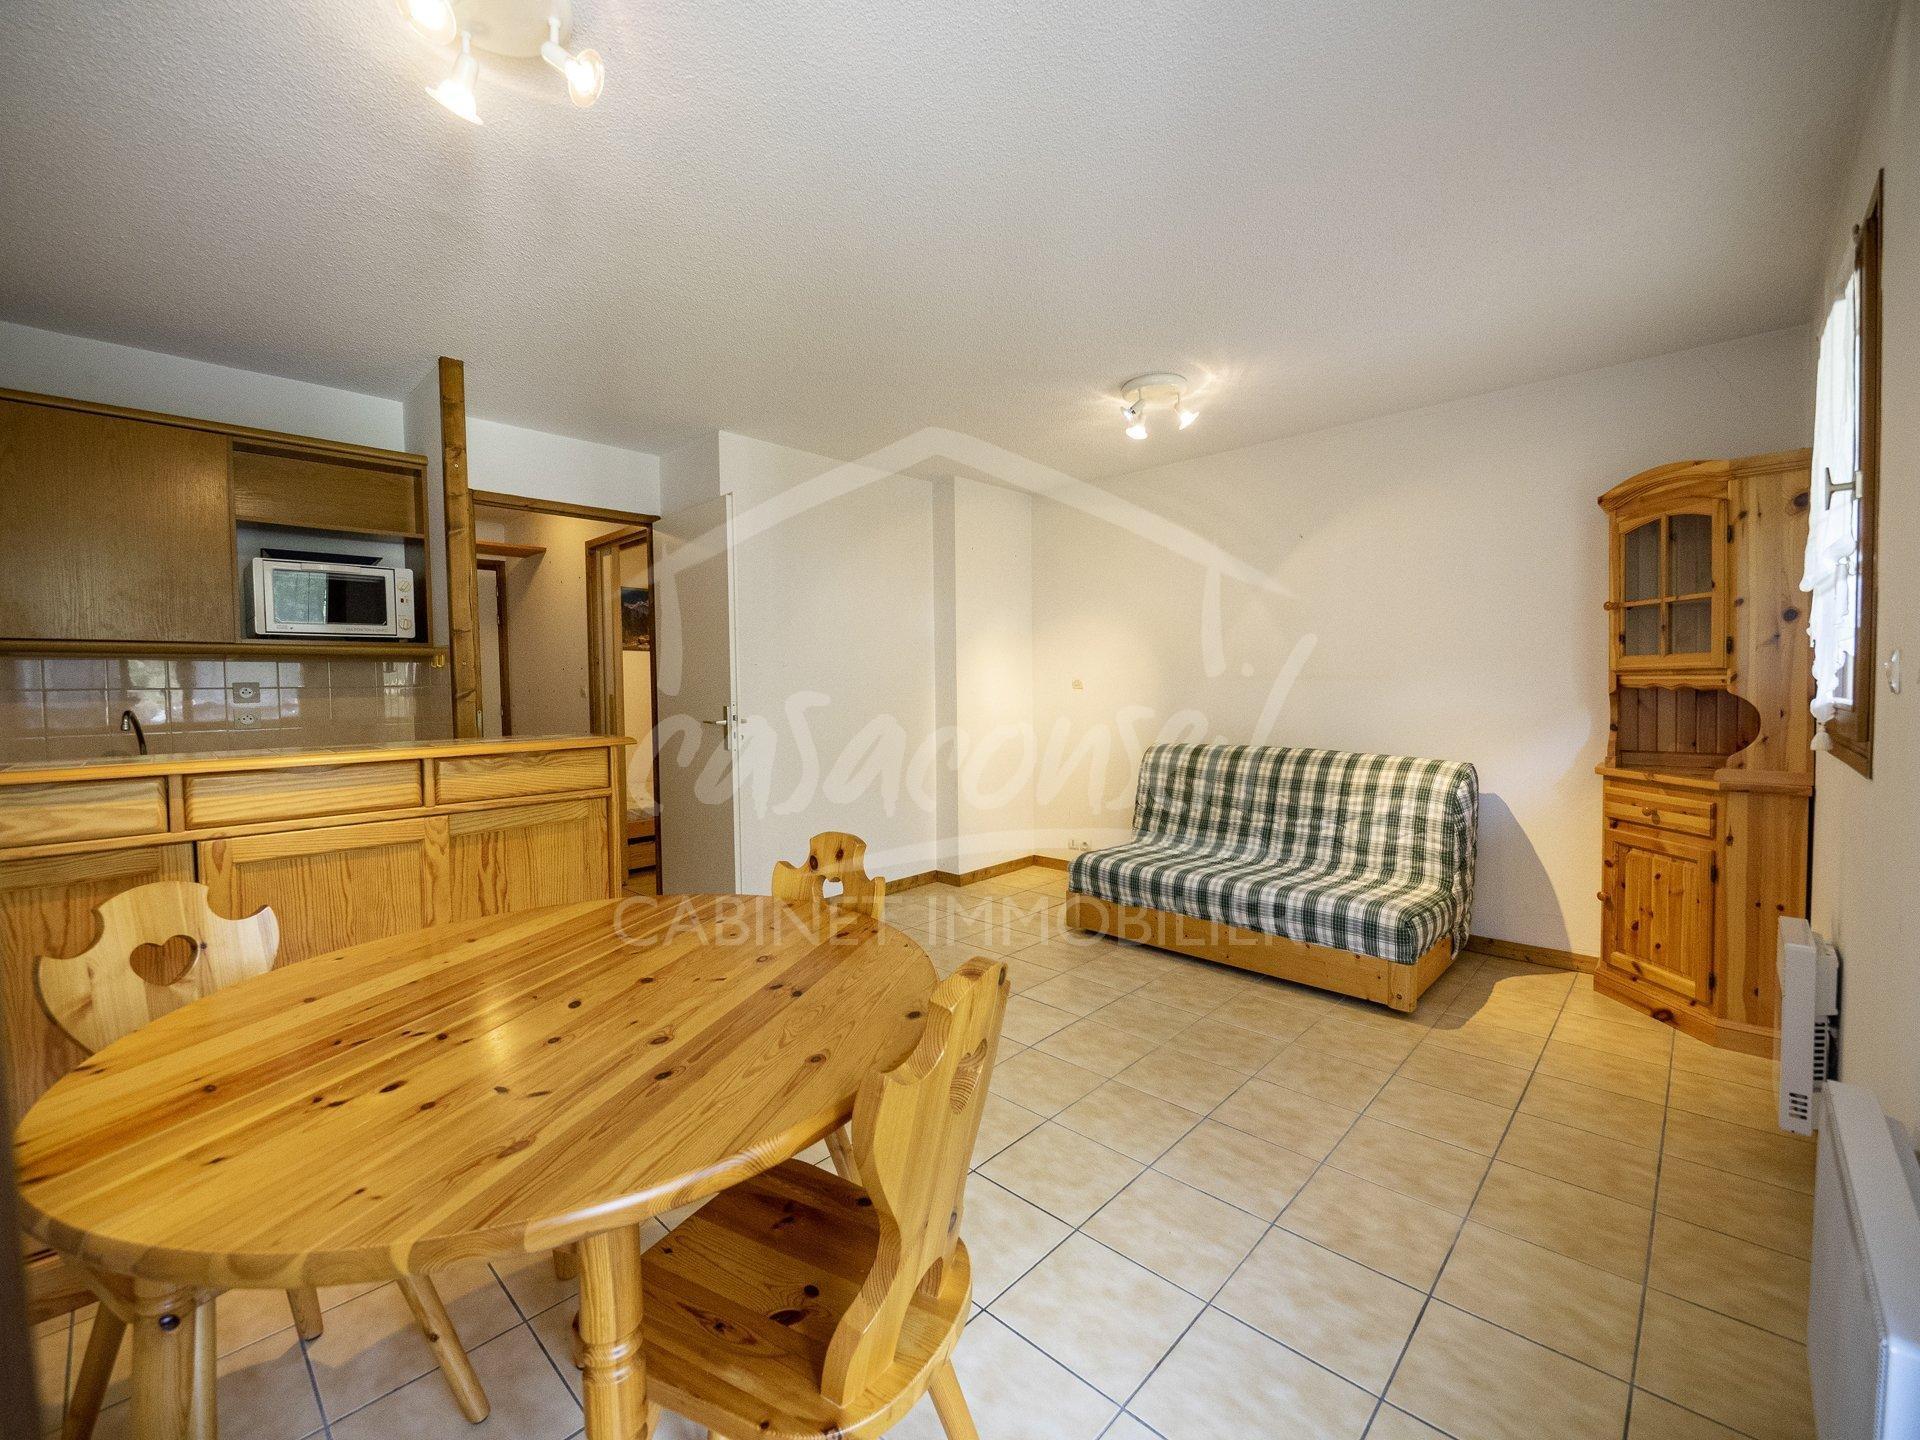 Sale Apartment - Les Contamines-Montjoie